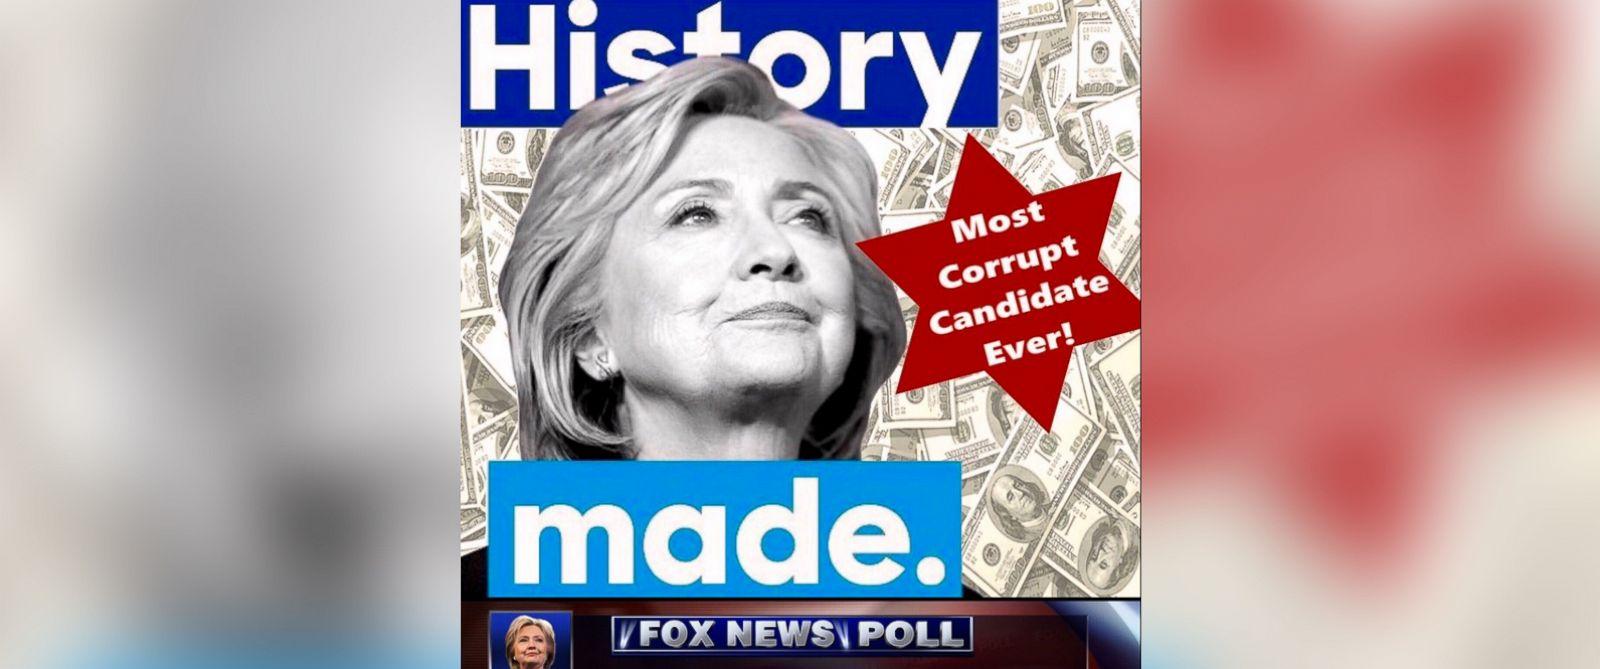 news world donald trump tweets racist meme with hillary clinton star david